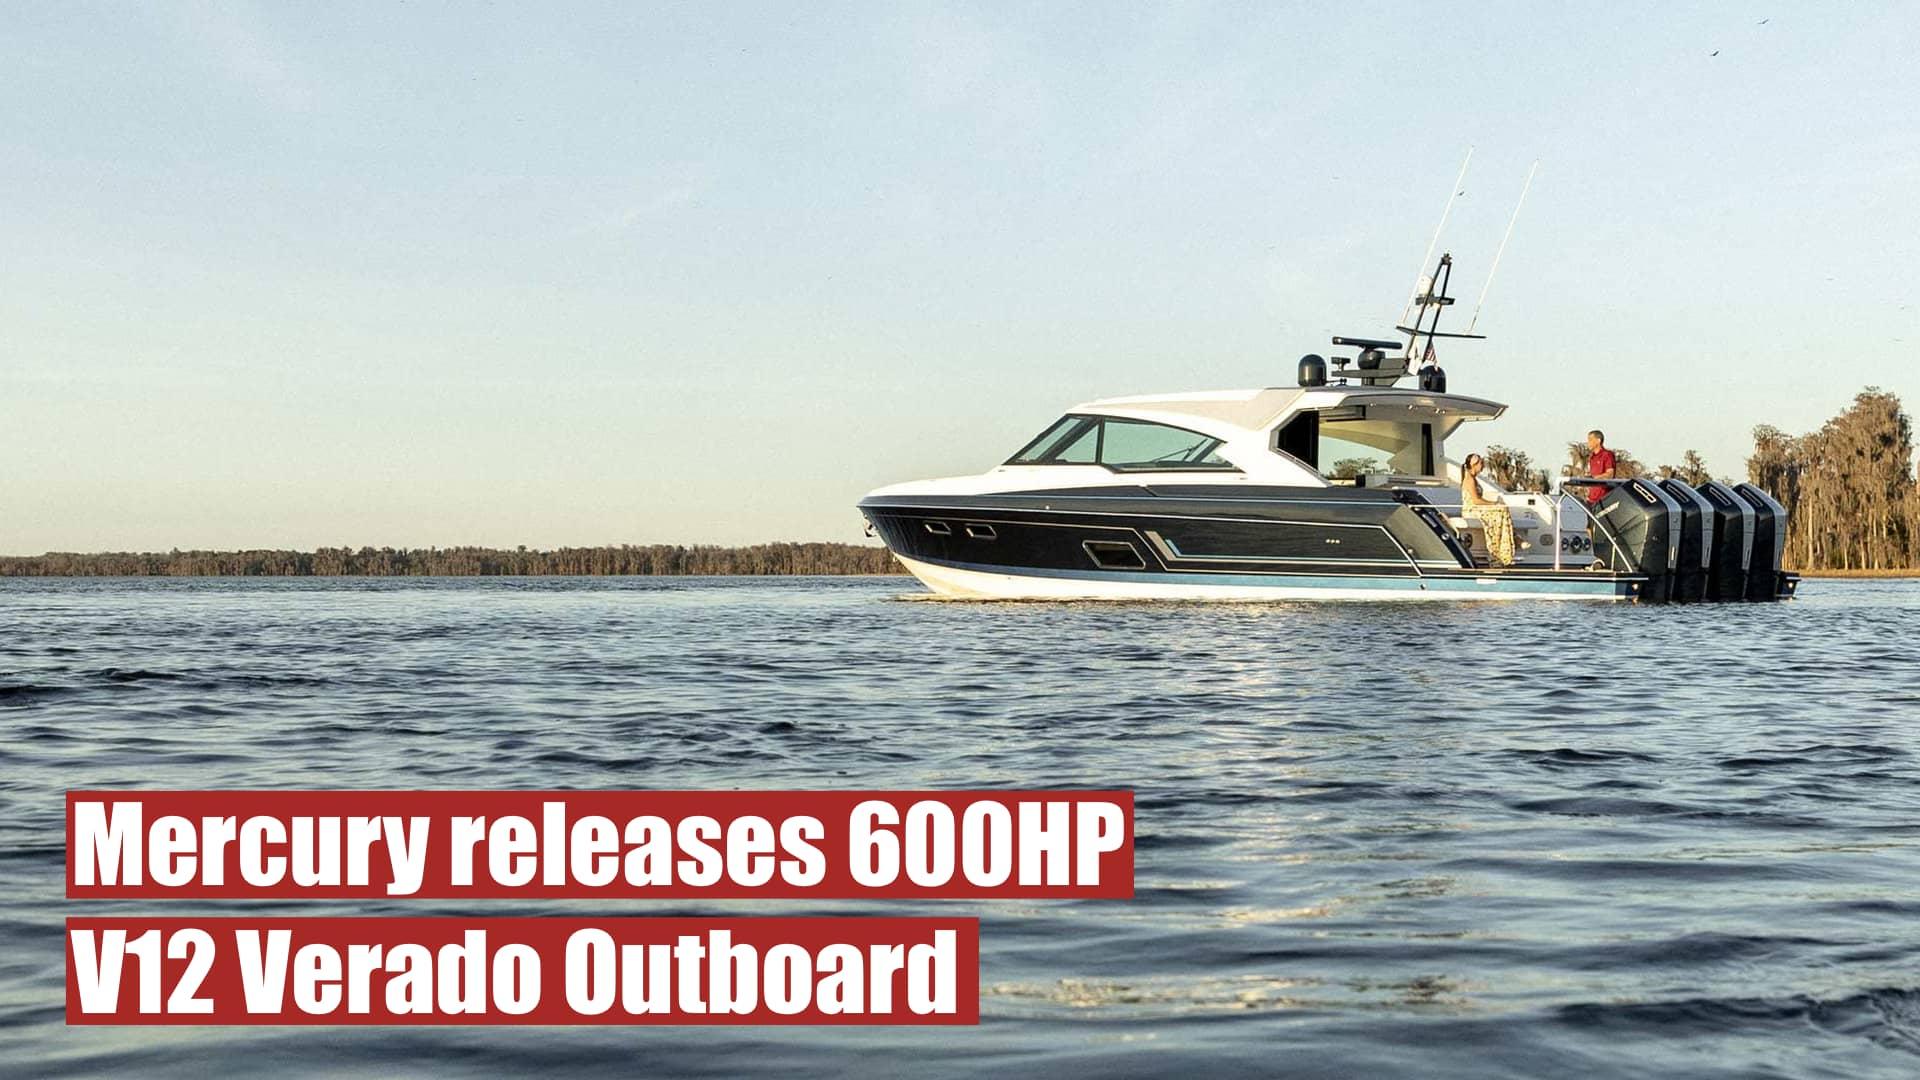 Luxury Performance: Mercury releases 600HP V12 Verado Outboard